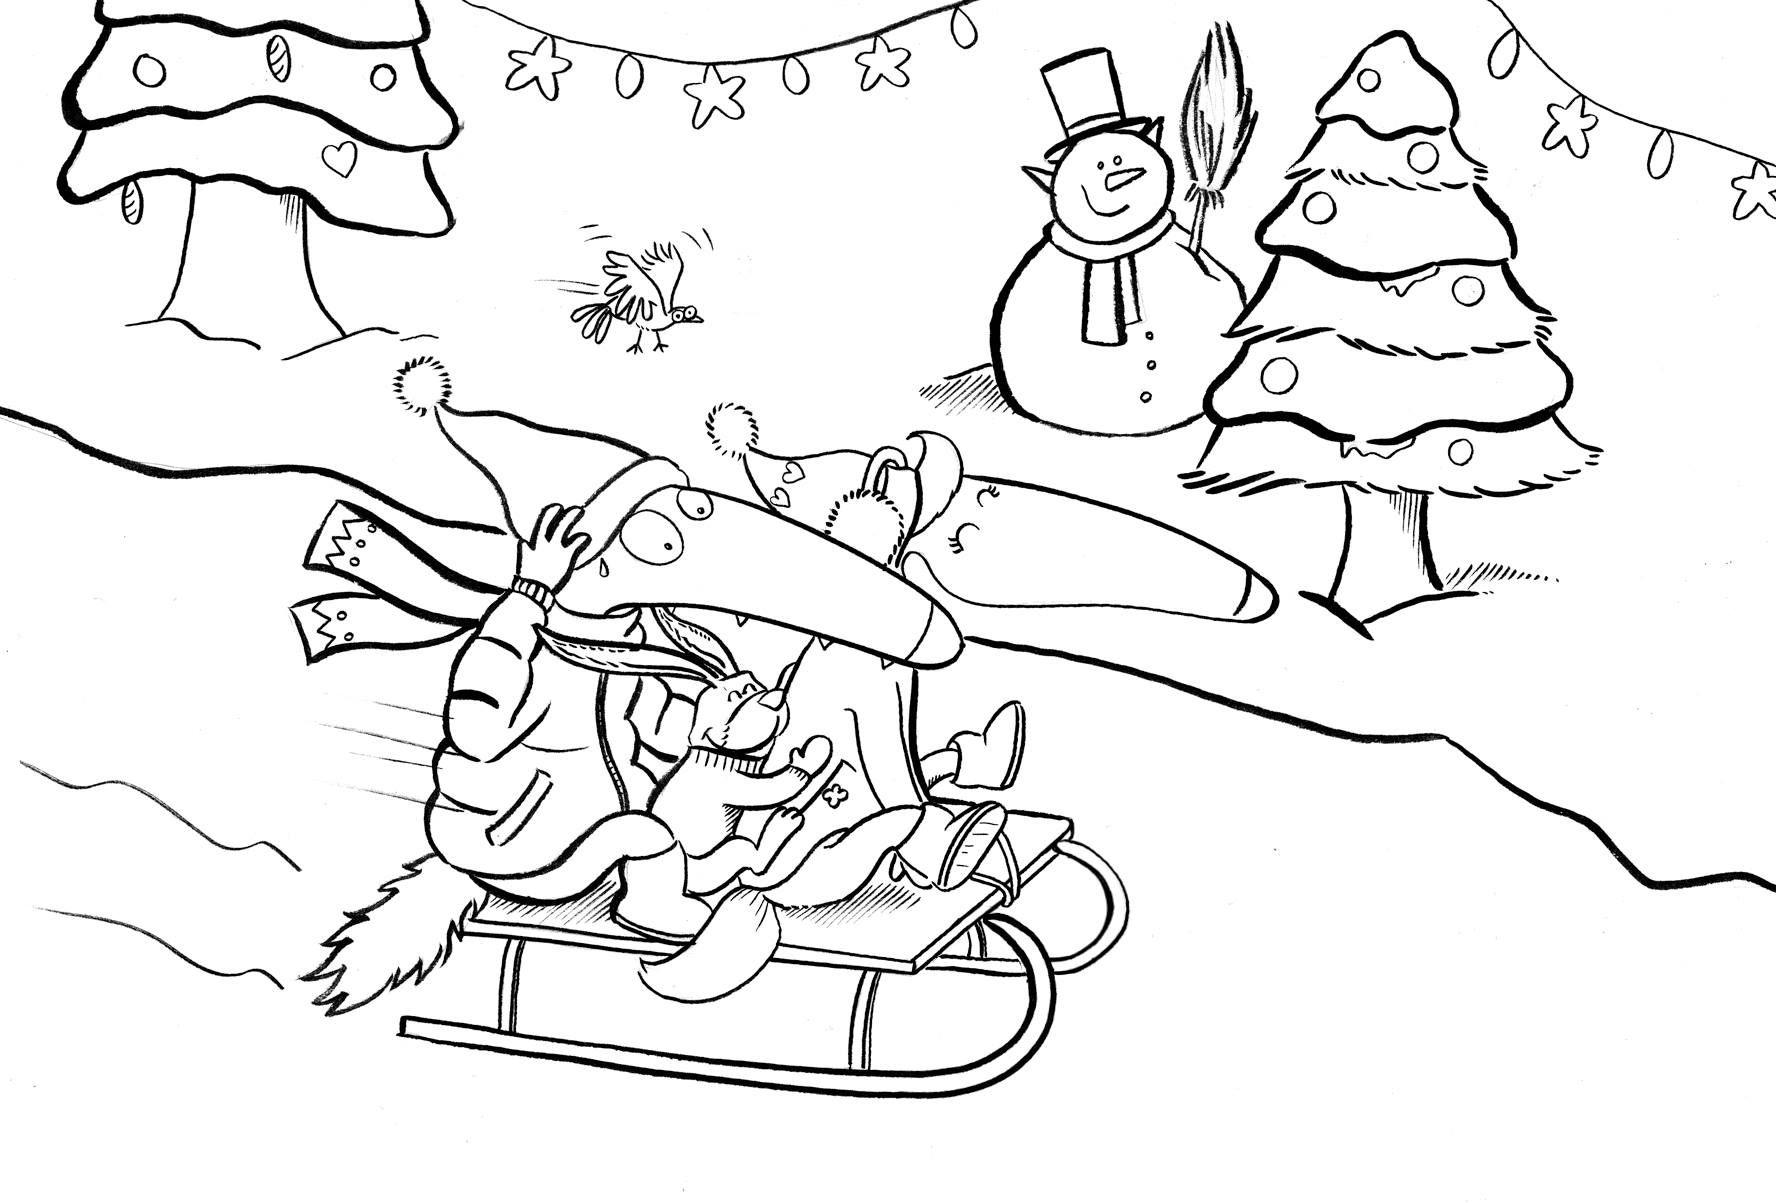 Loup Joyeux Noel A Tous